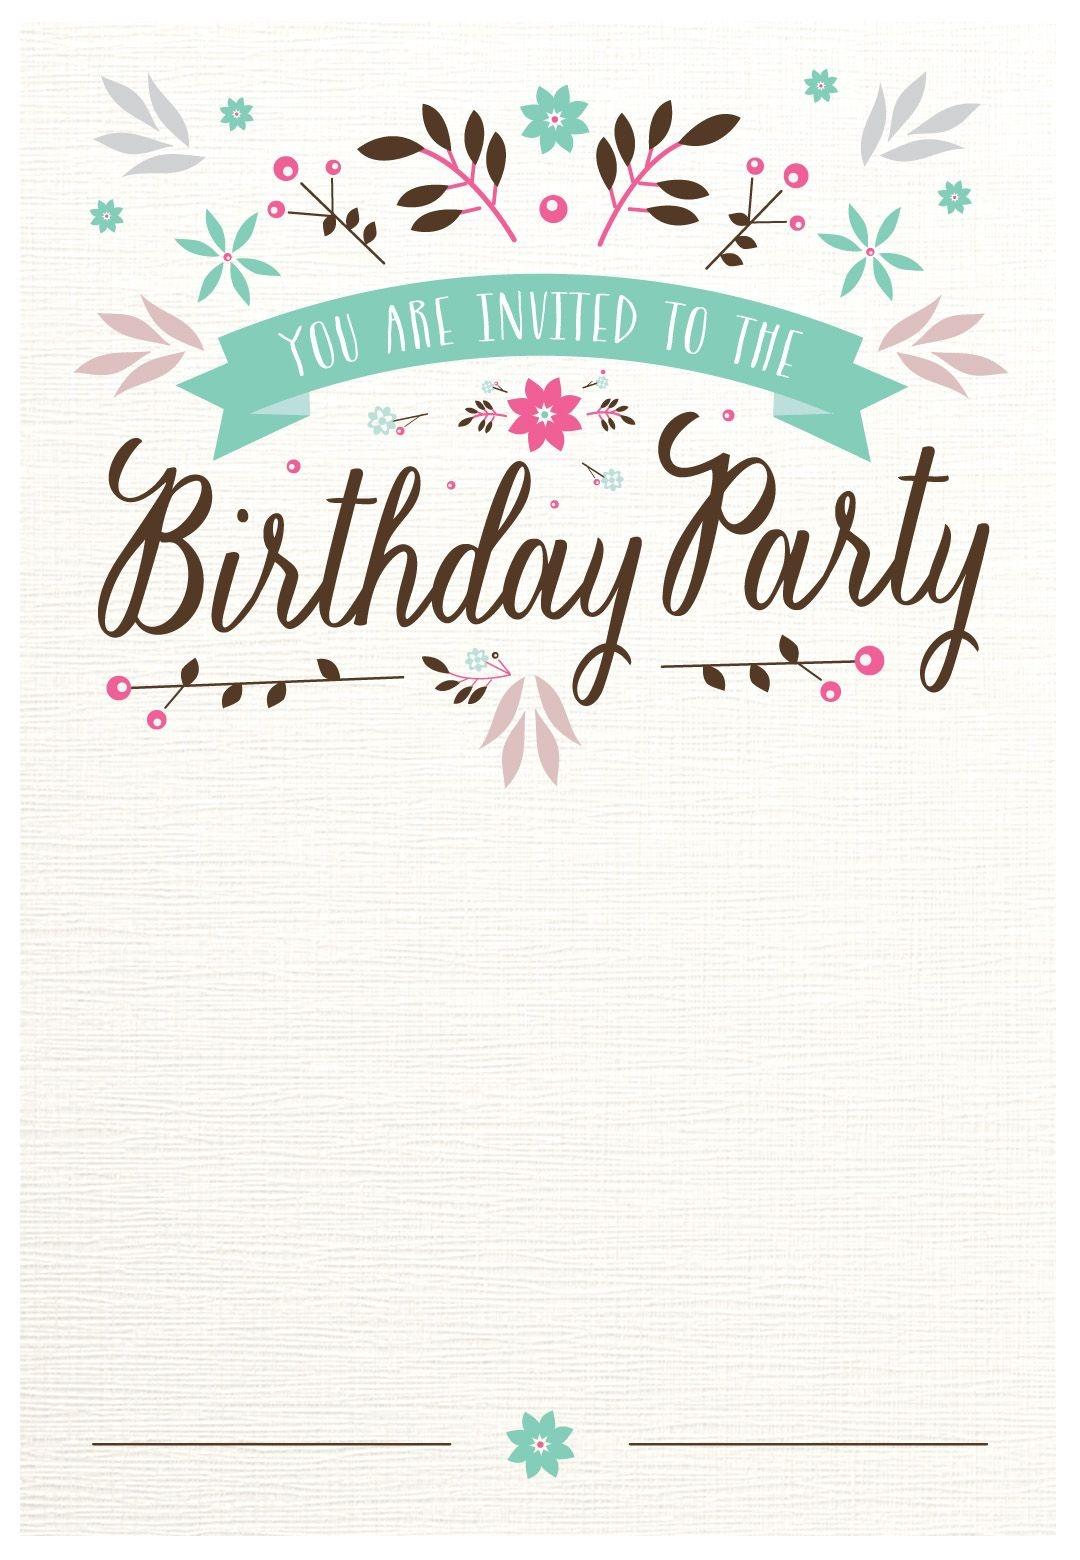 Flat Floral - Free Printable Birthday Invitation Template - Free Printable Birthday Invitation Cards